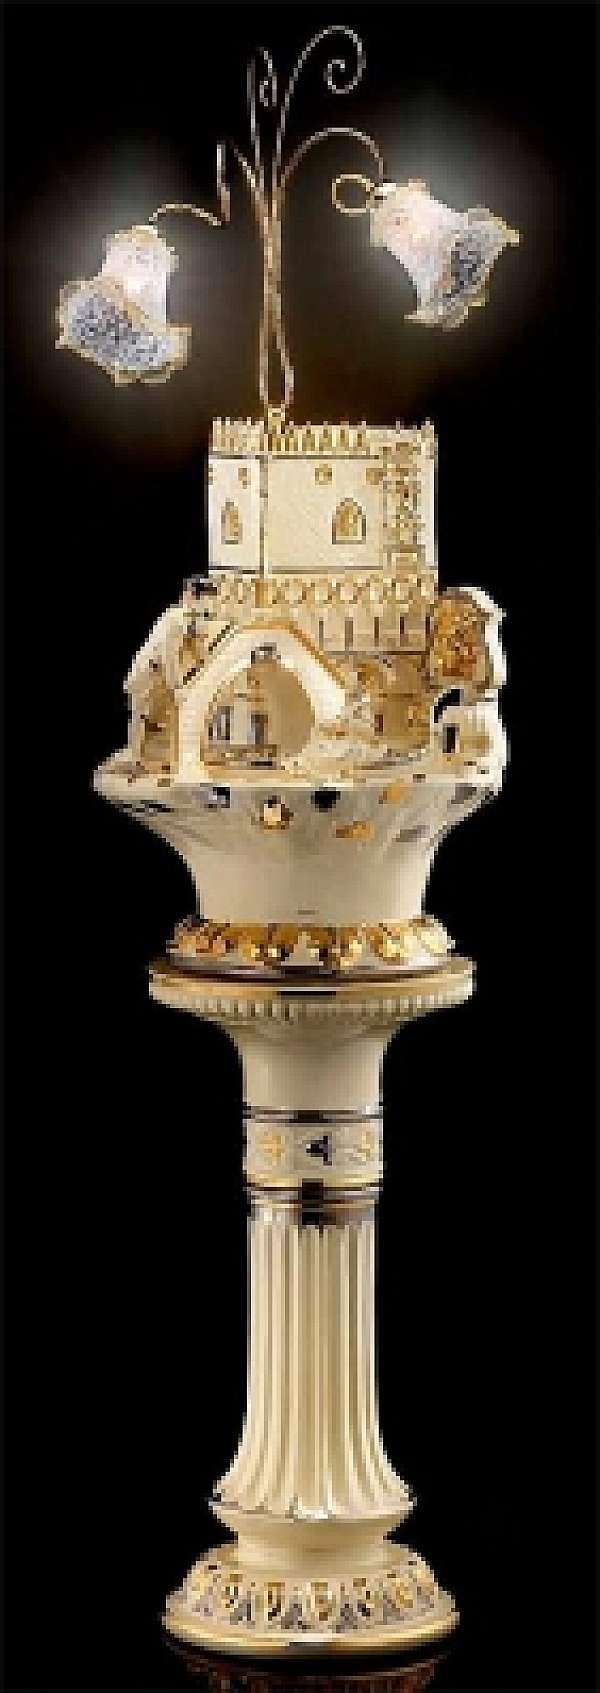 Напольная лампа LORENZON (F.LLI LORENZON) L.644/COLF